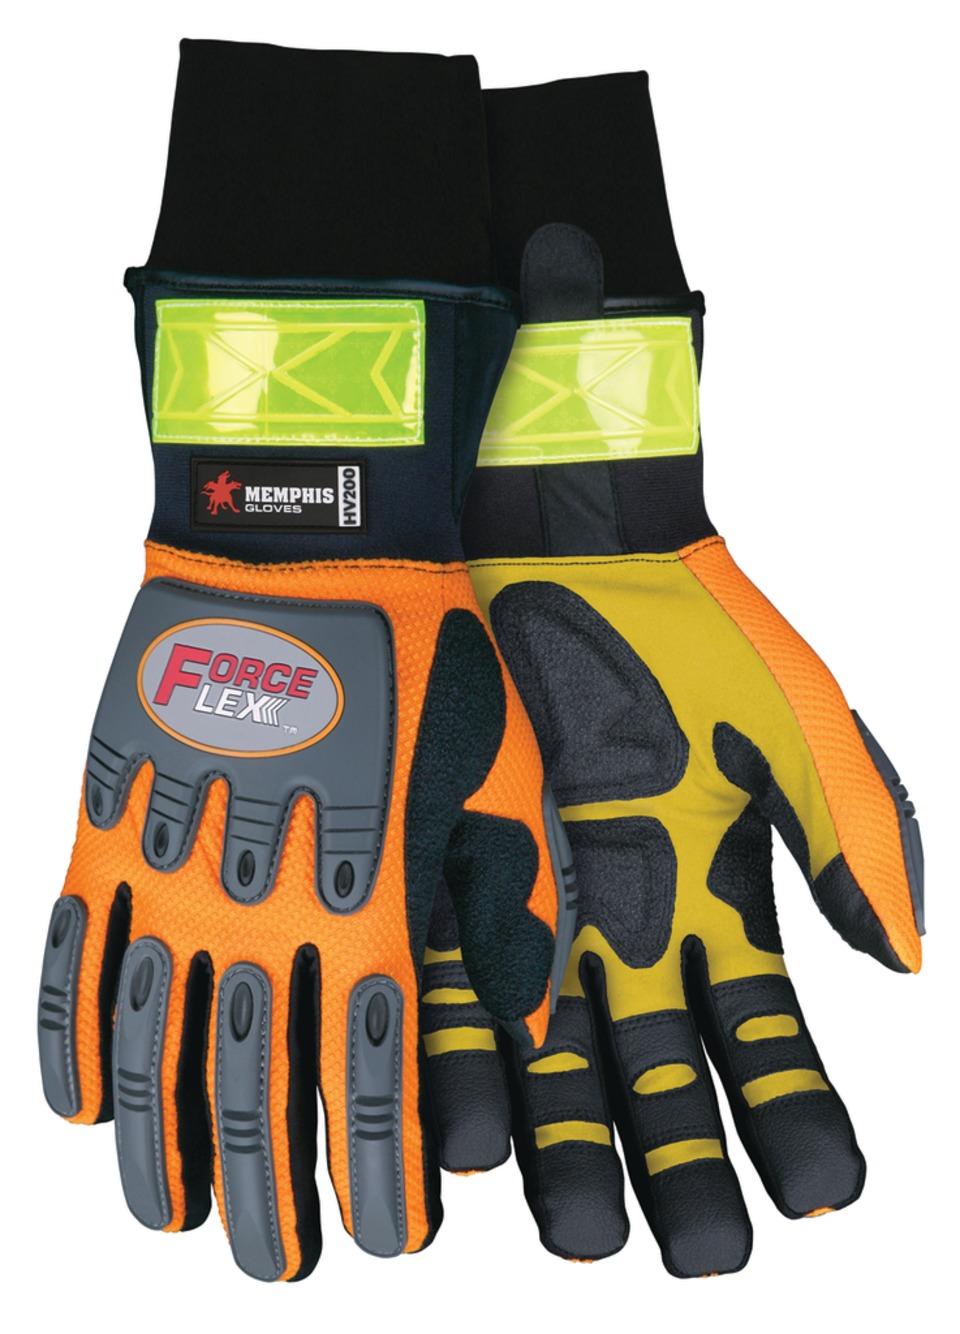 Mcr Safety Forceflex Kv200 Gloves In Gloves And Hand -6723